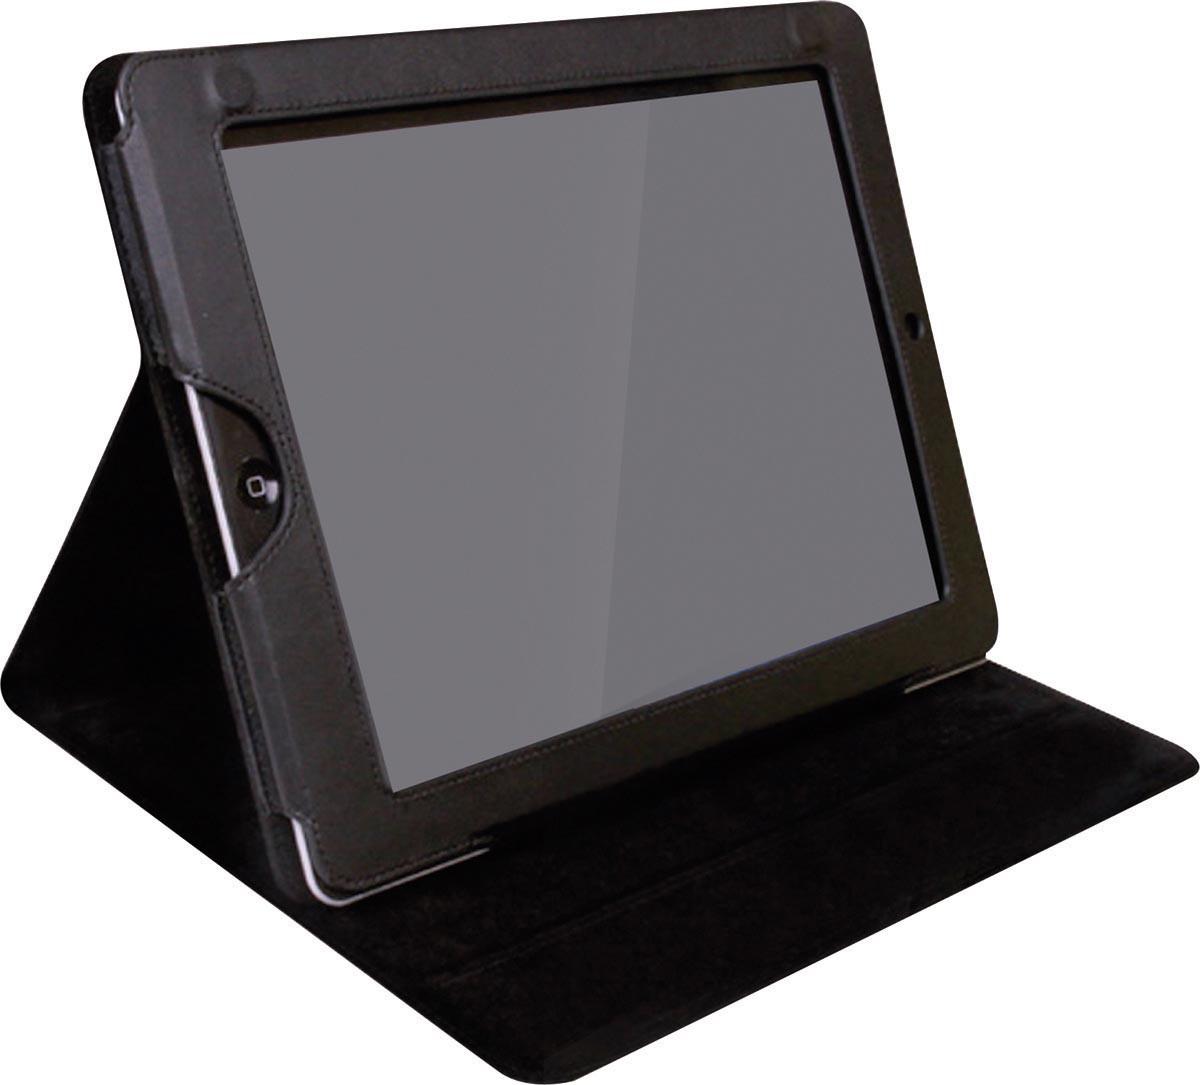 Case com Suporte para iPad até 10 Polegas Preta BO099 Multilaser